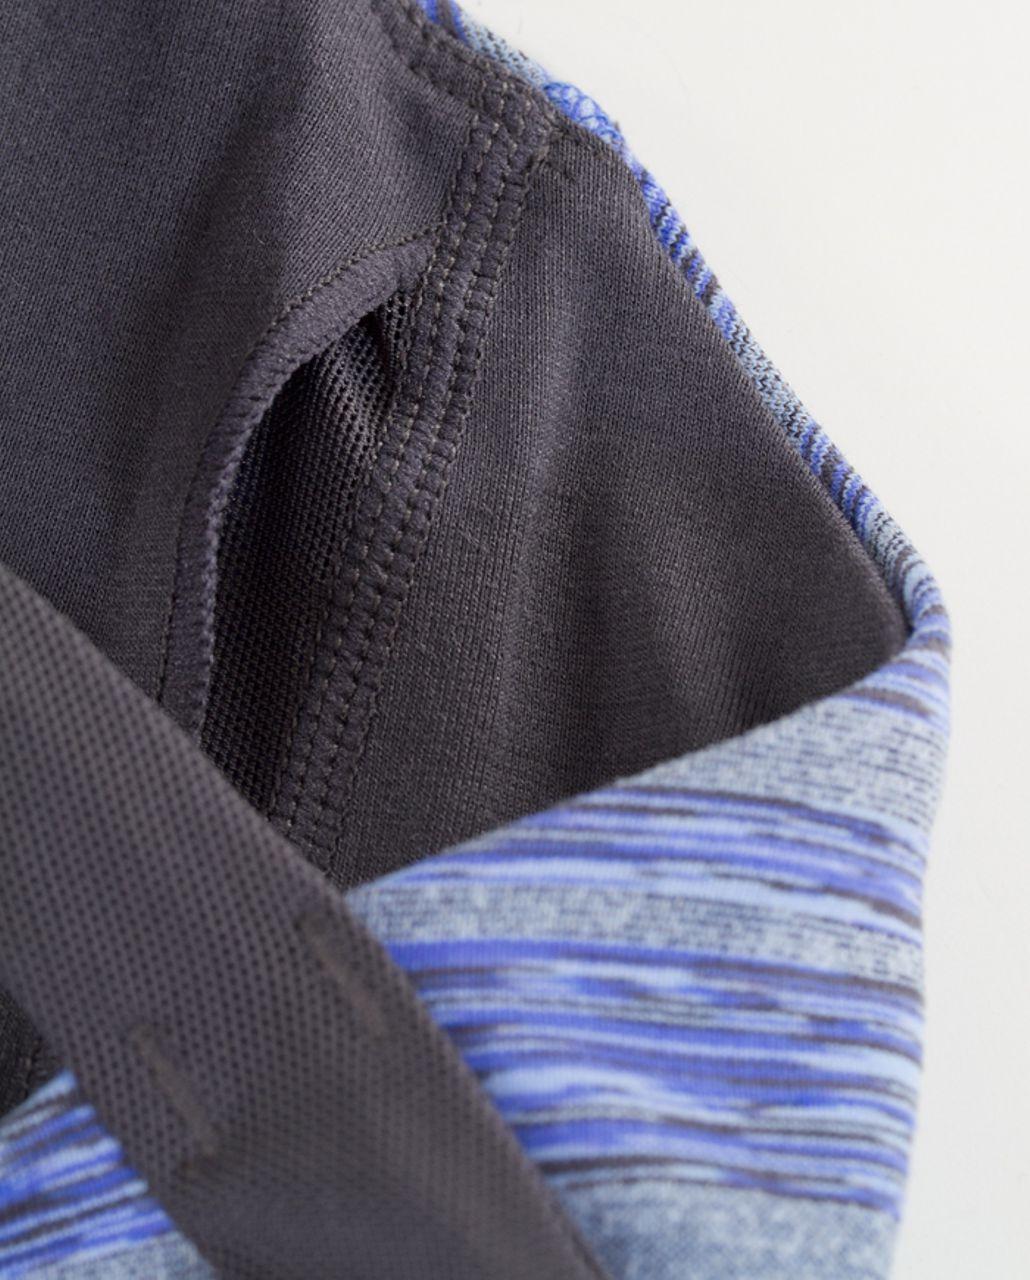 Lululemon 50 Rep Bra - Rocksteady Stripes Galore /  Coal